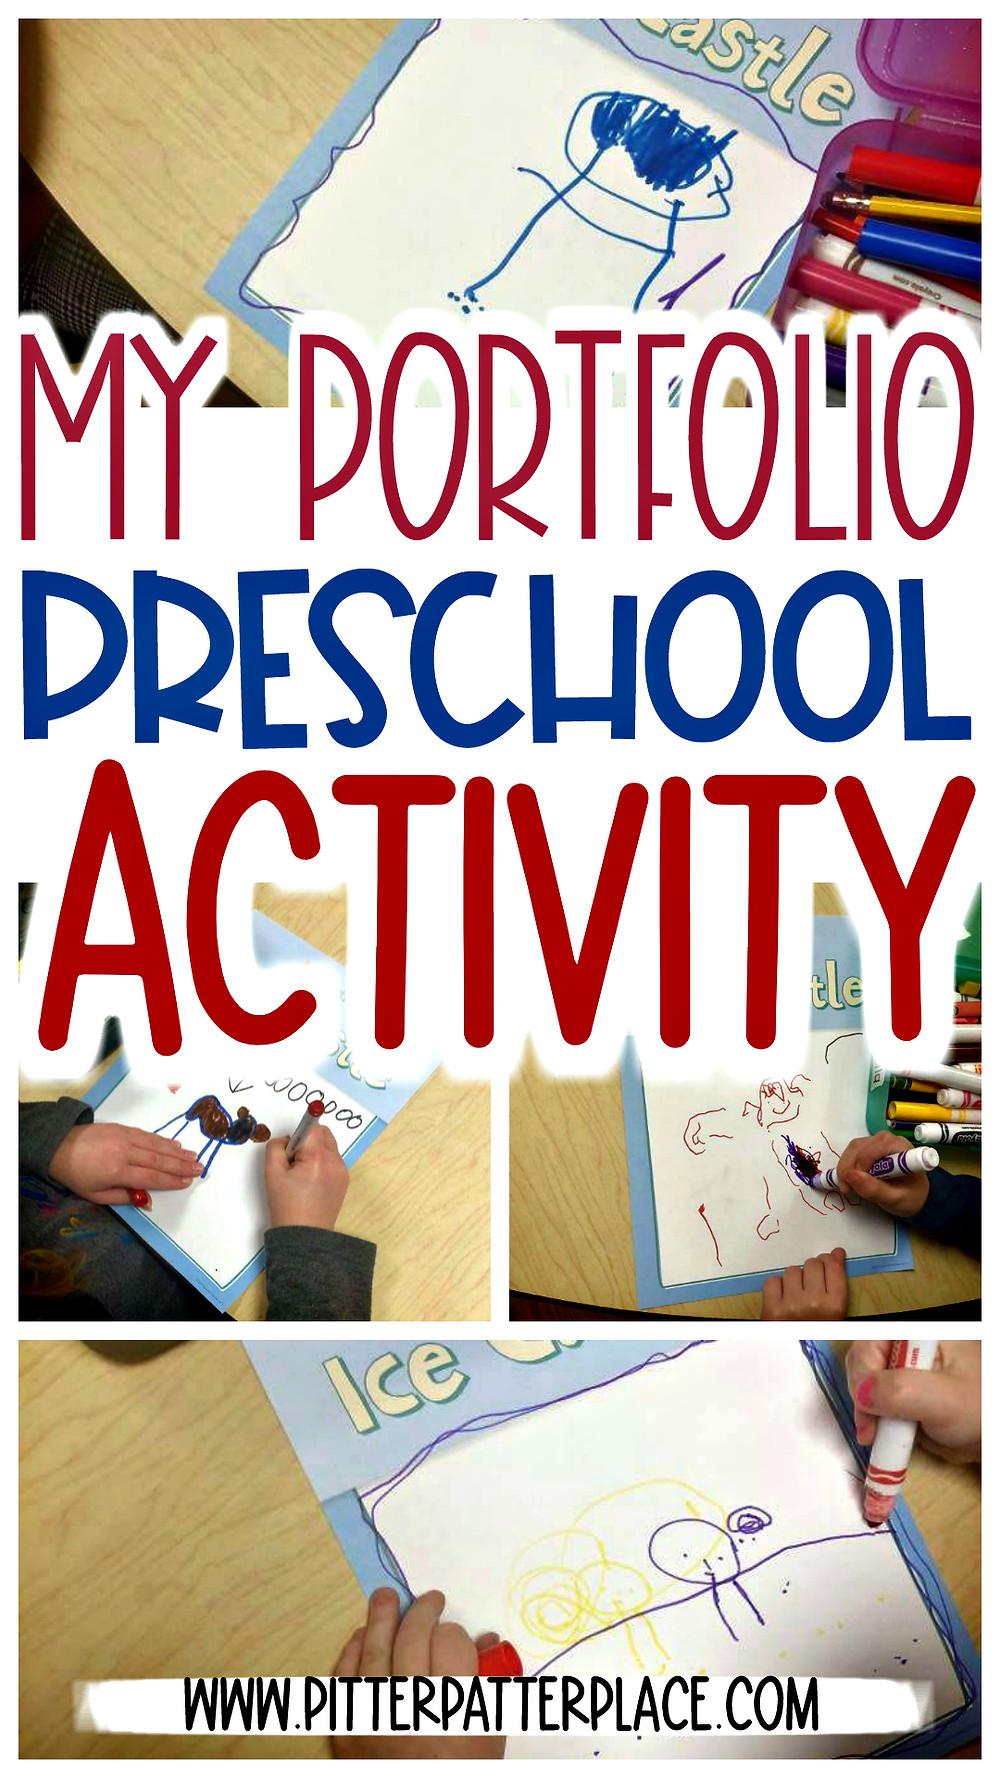 preschool portfolio images with text: My Portfolio Preschool Activity